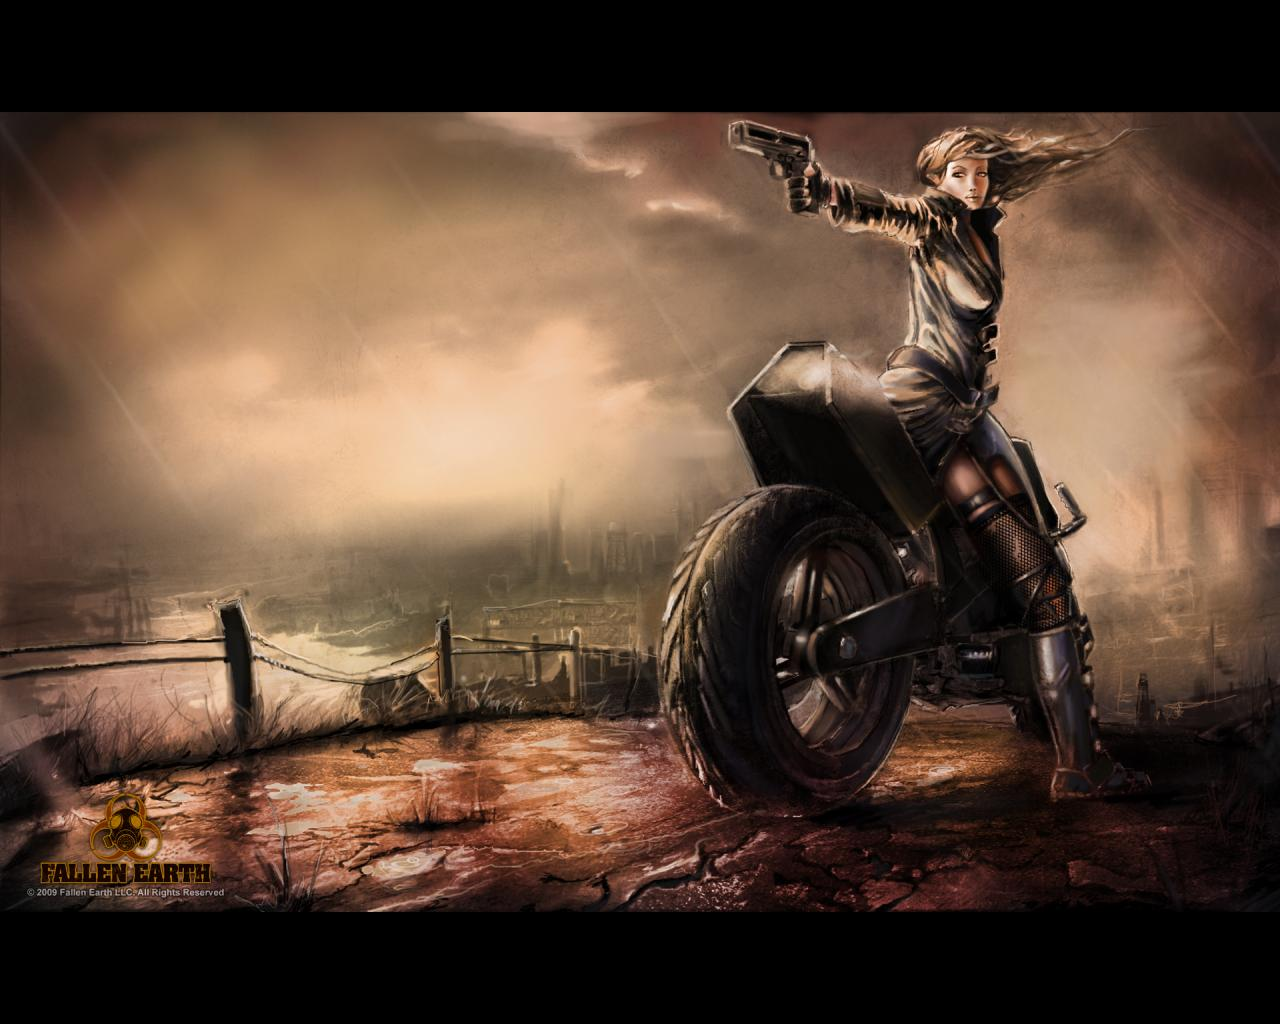 Chick On Bike Wallpaper  WallpaperSafari